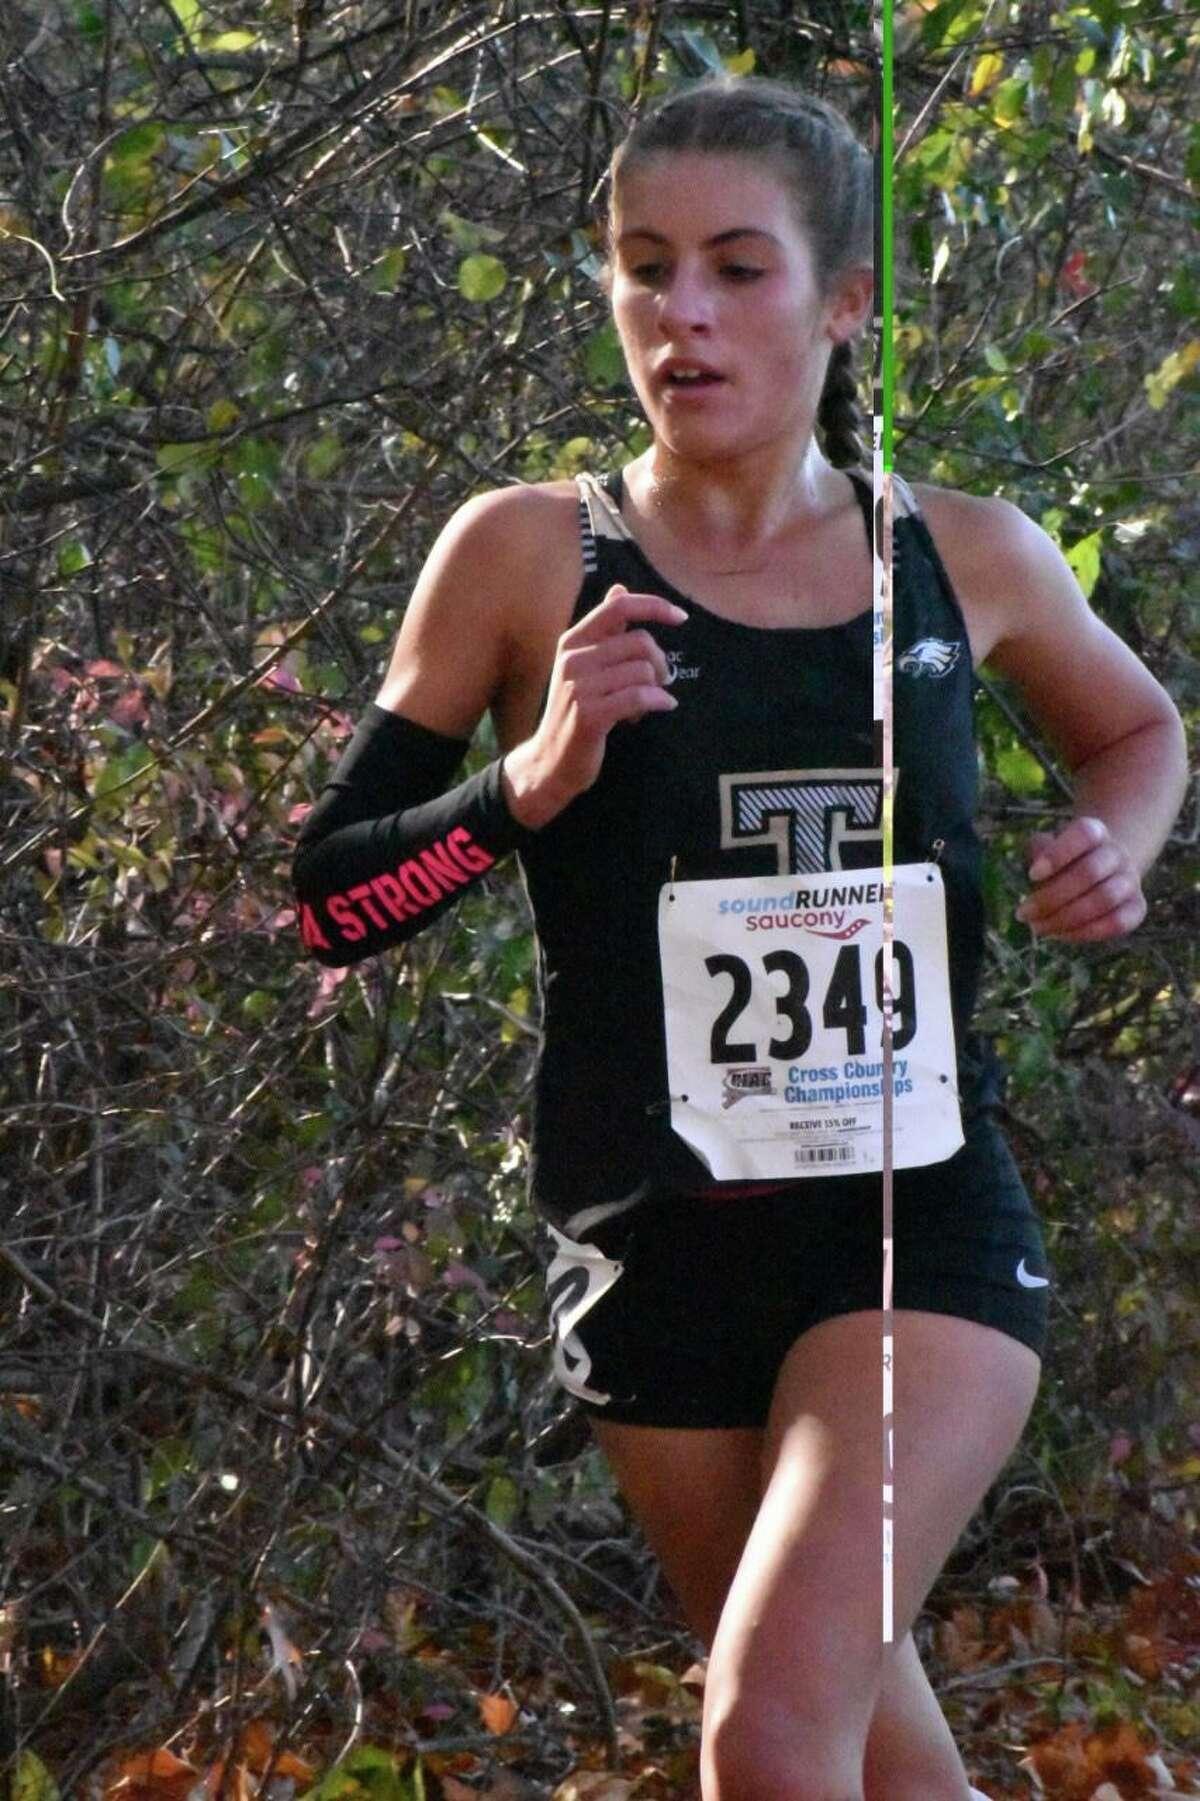 Alessandra Zaffina has chosen to run cross country for the Quinnipiac University Bobcats.